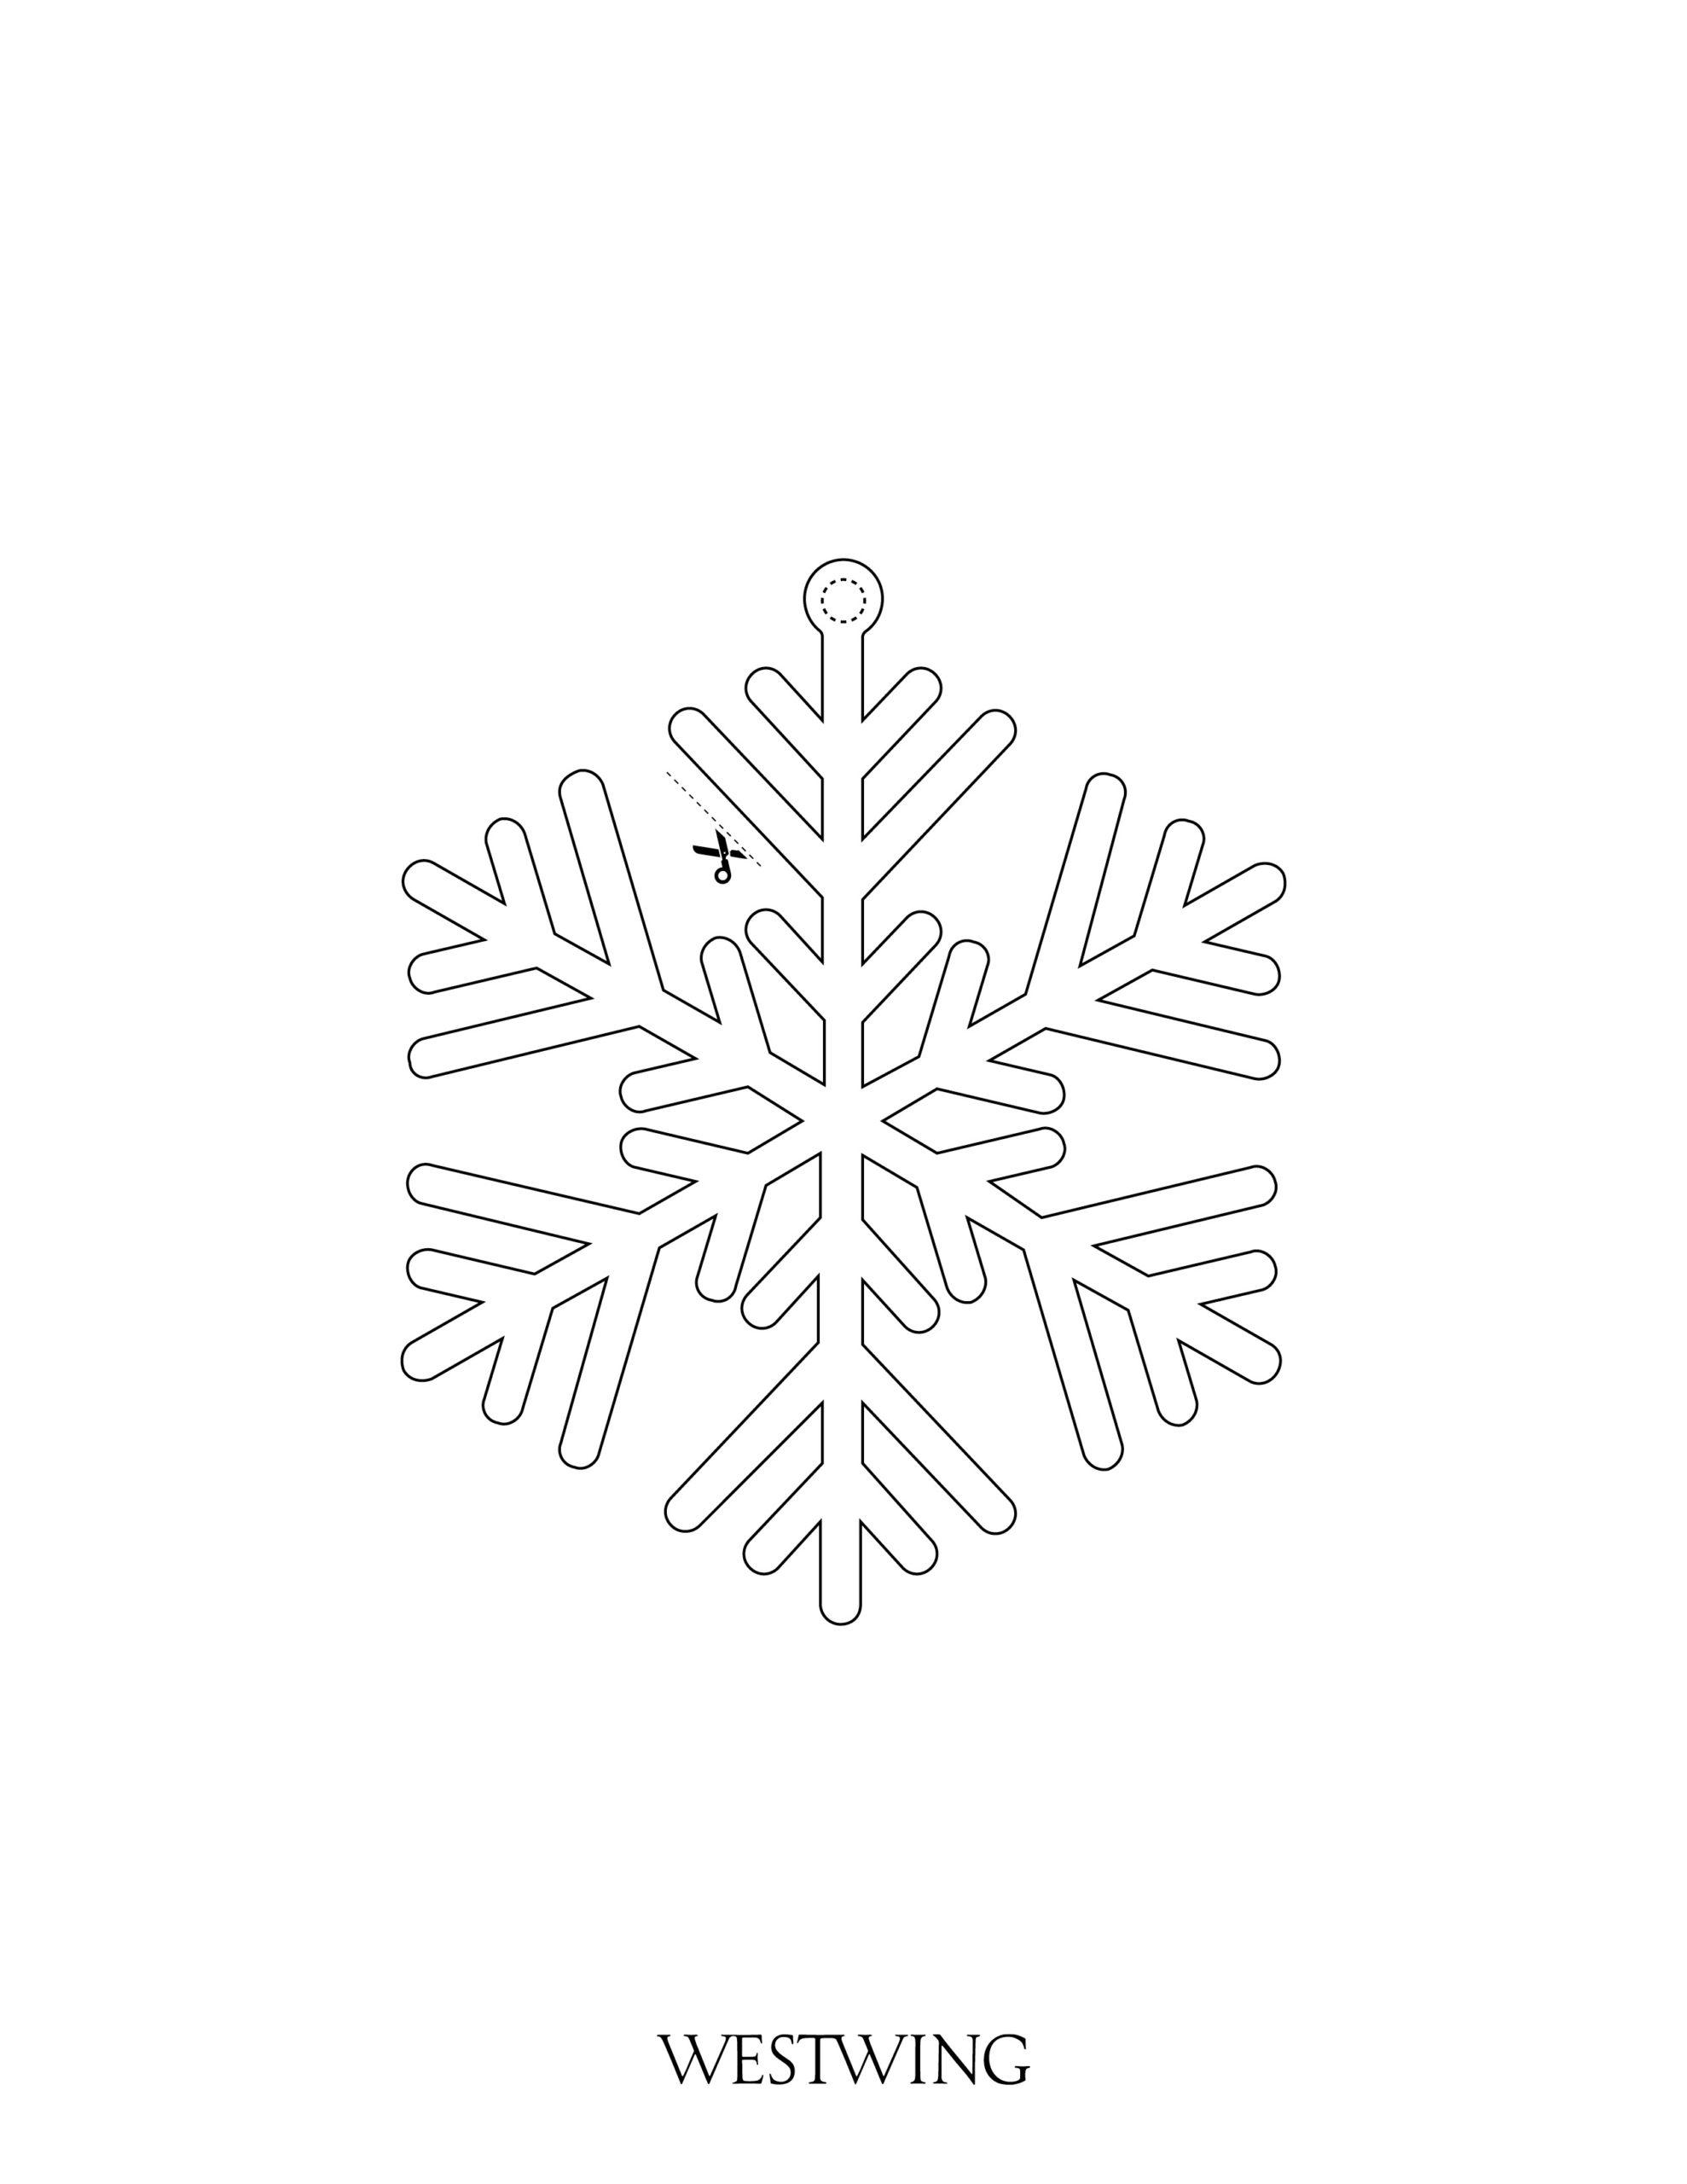 Wzór śnieżynki